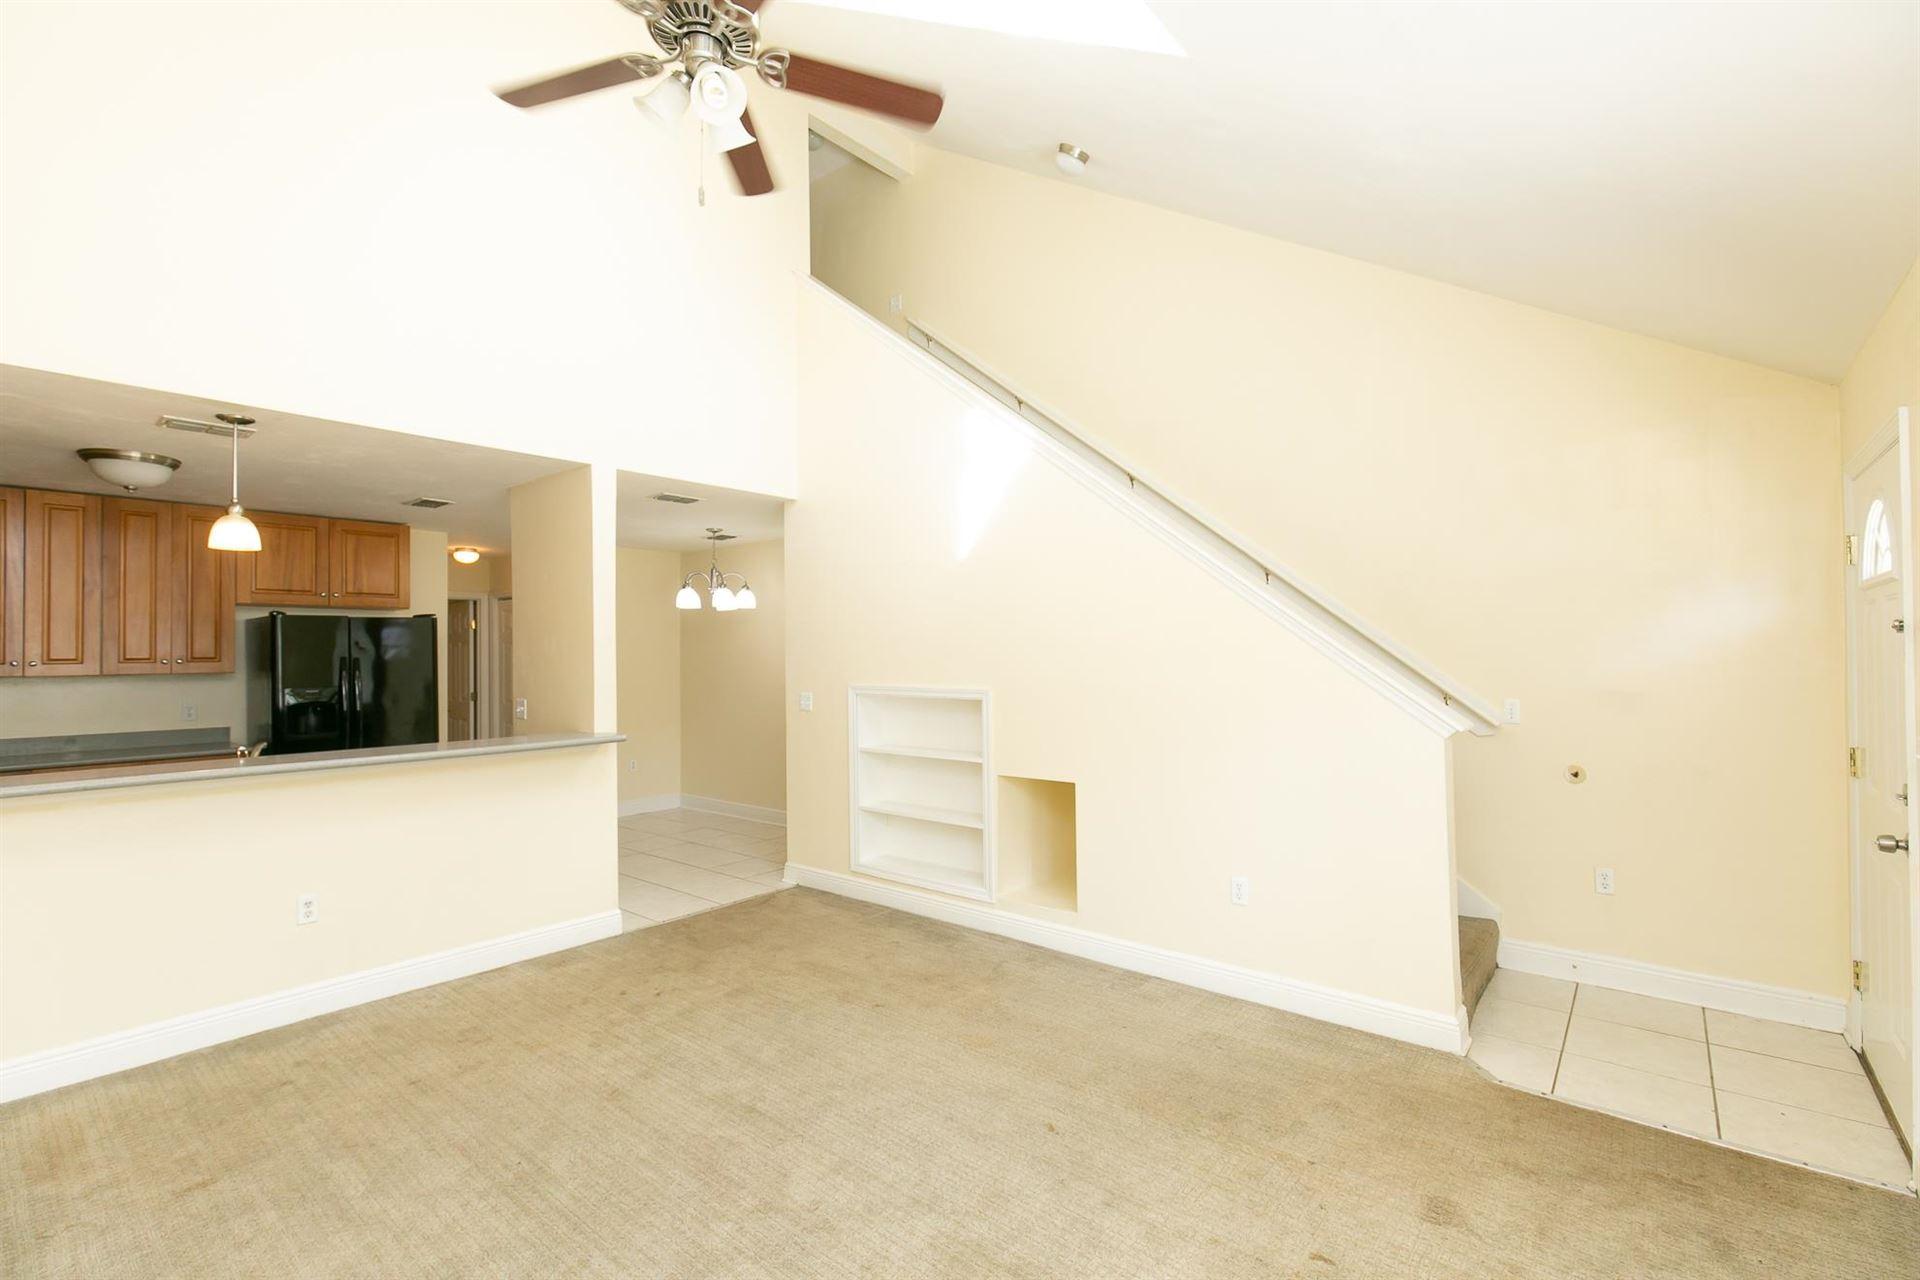 Photo of 3204 Sawtooth, TALLAHASSEE, FL 32303 (MLS # 337162)